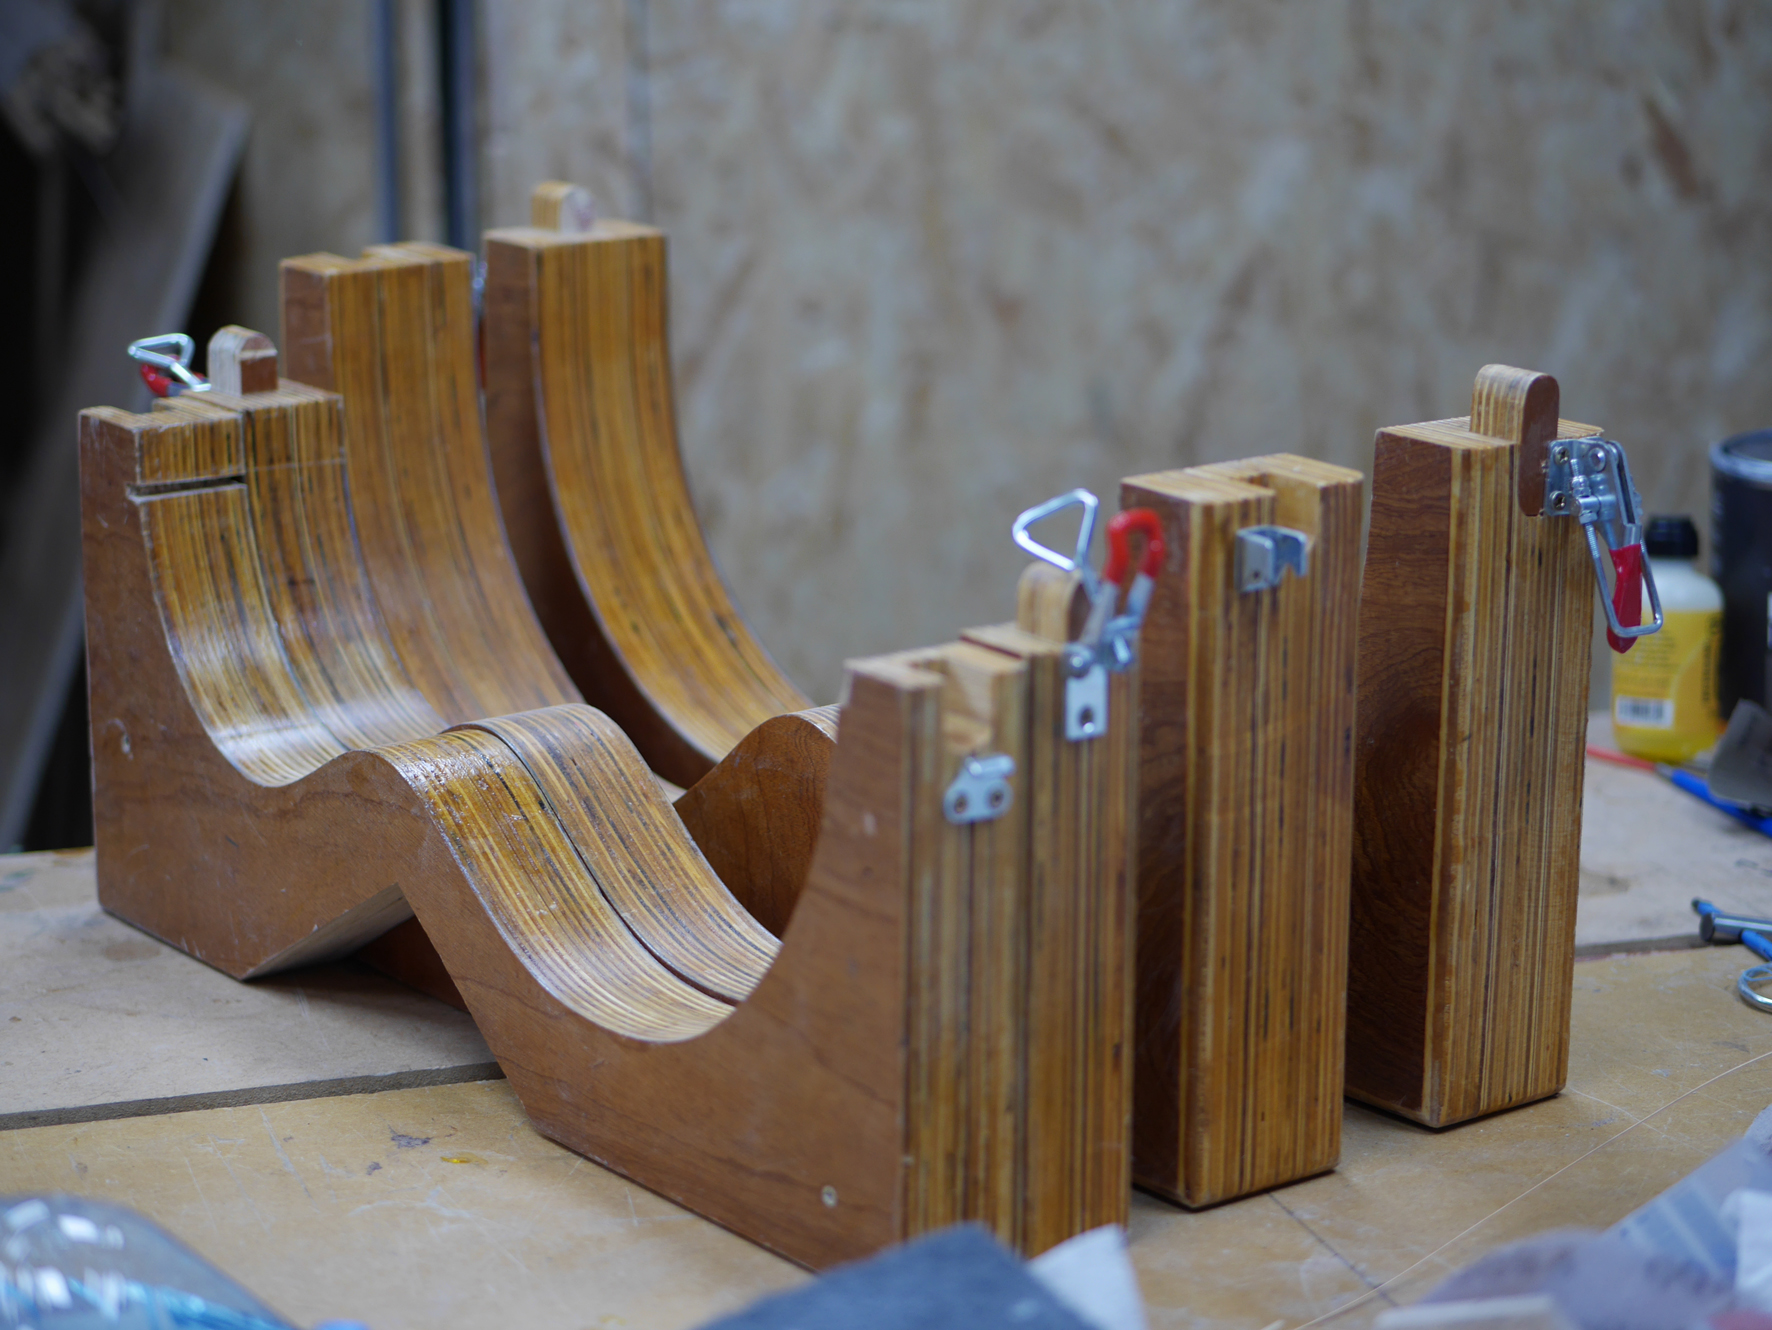 montgomery guitars, workshop